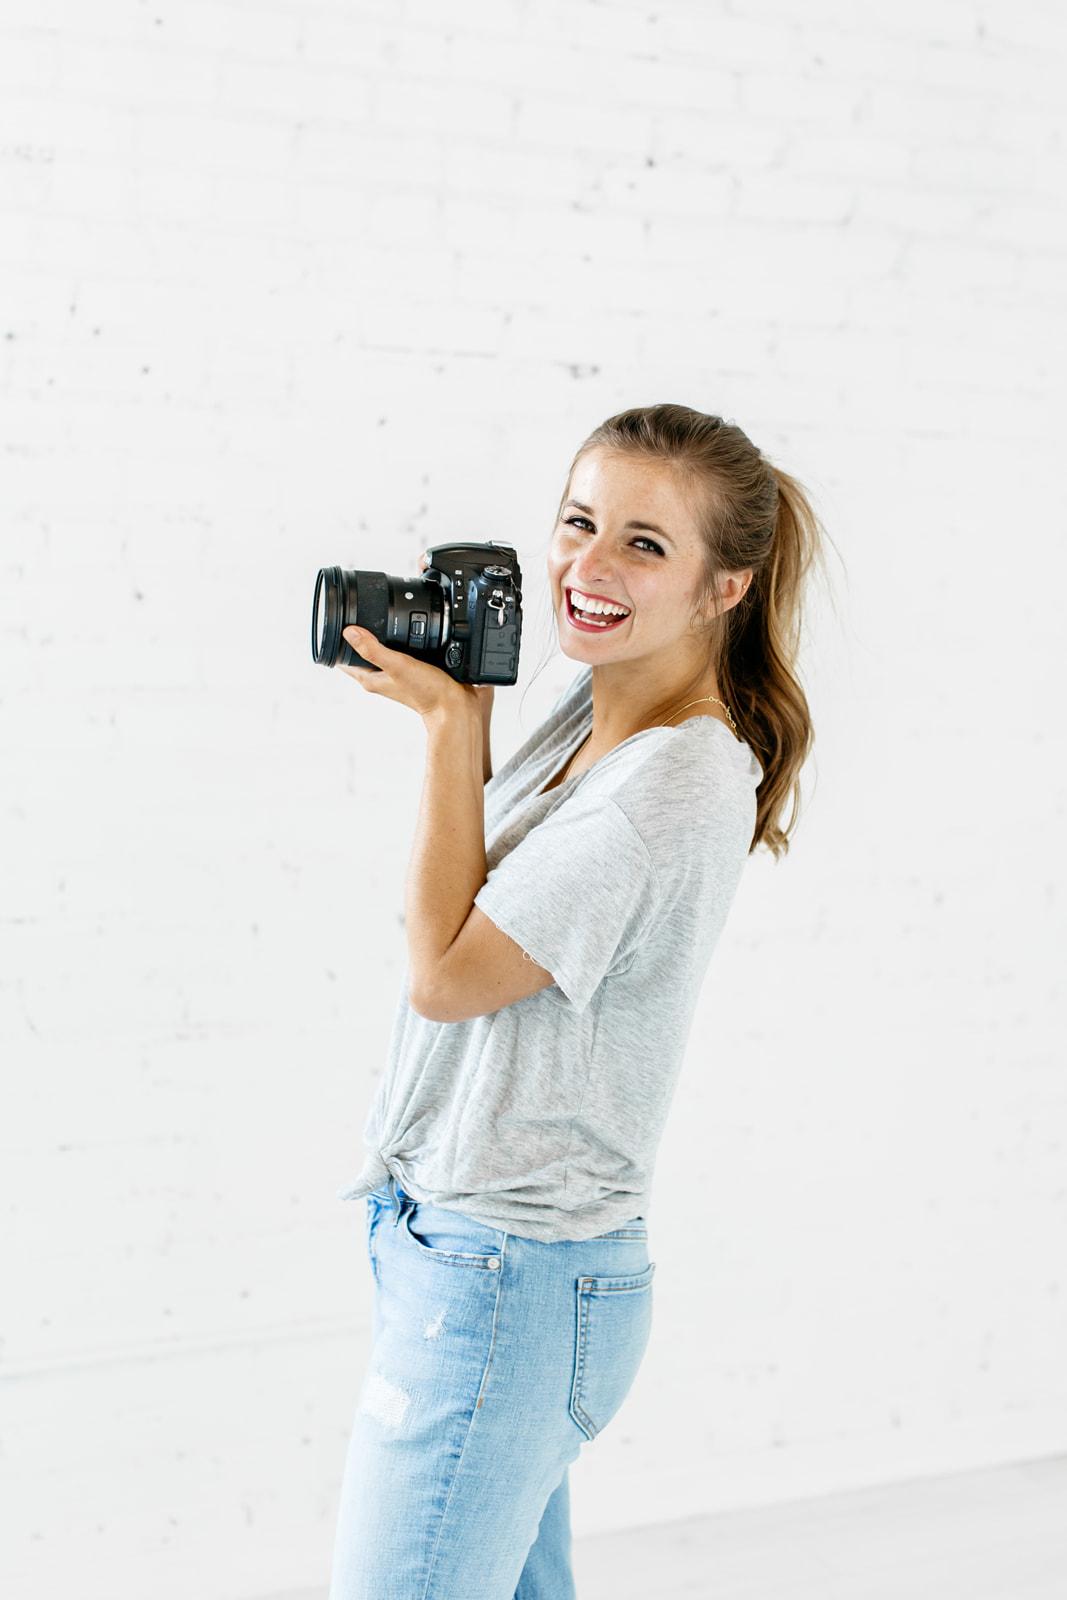 Alexa-Vossler-Photo_Dallas-Headshot-Photographer_Photographer-Headshots-at-The-Lumen-Room_Kelcy-Enriquez-23.jpg